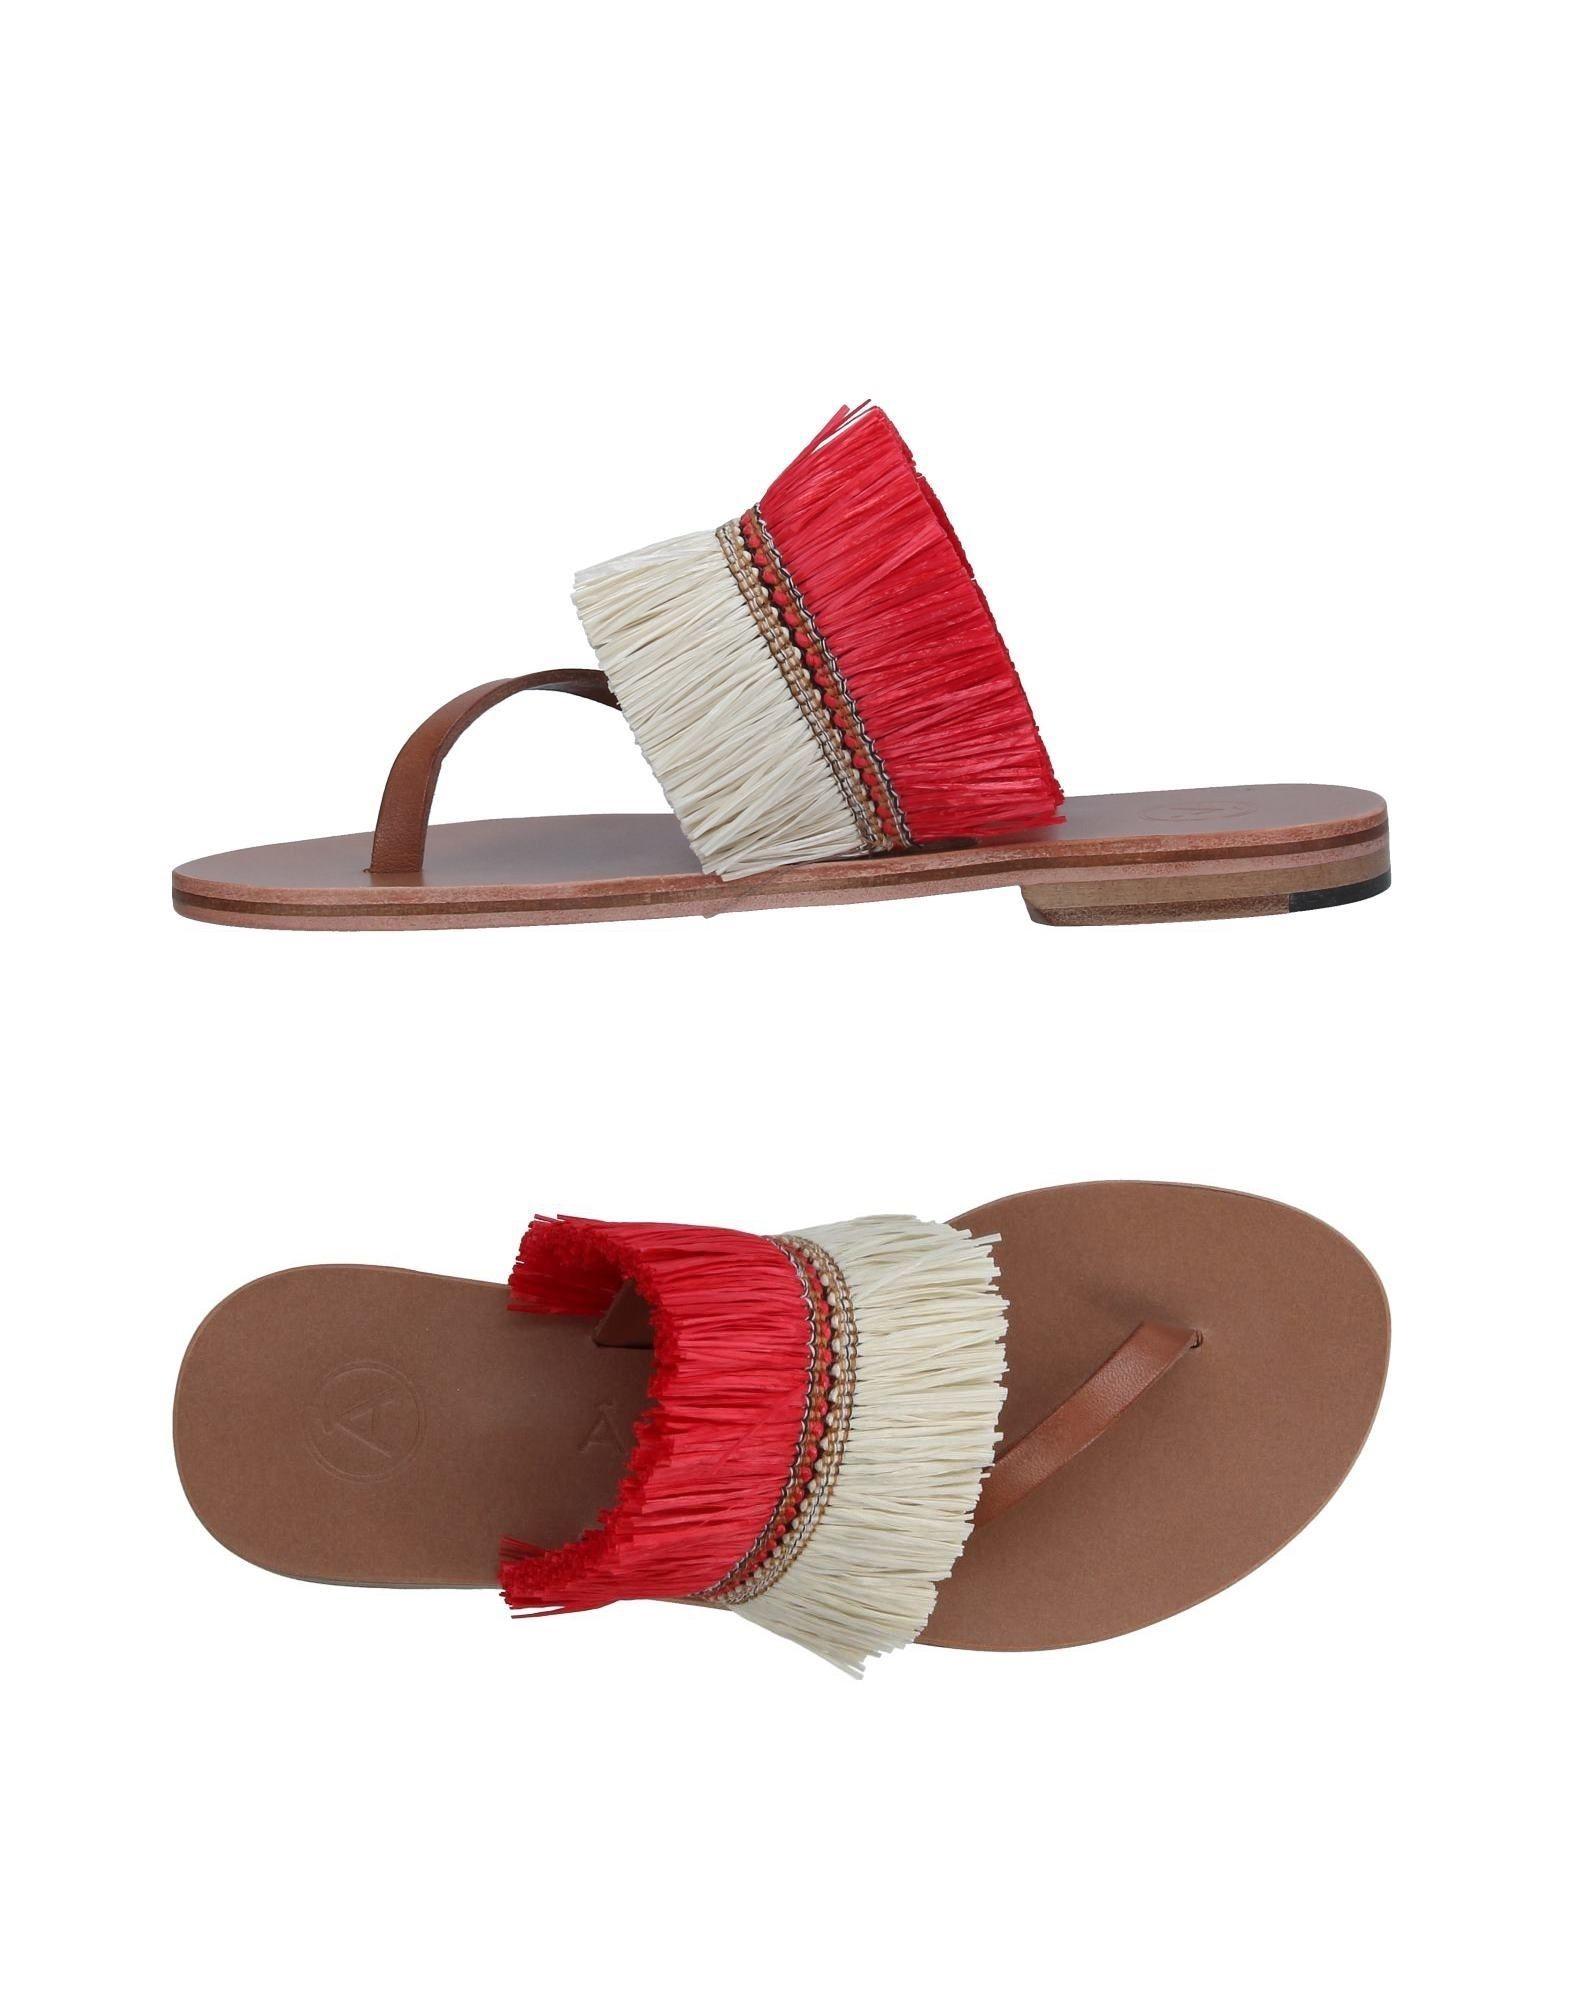 Álvaro 11343547WT González Dianetten Damen  11343547WT Álvaro Gute Qualität beliebte Schuhe 37e61f